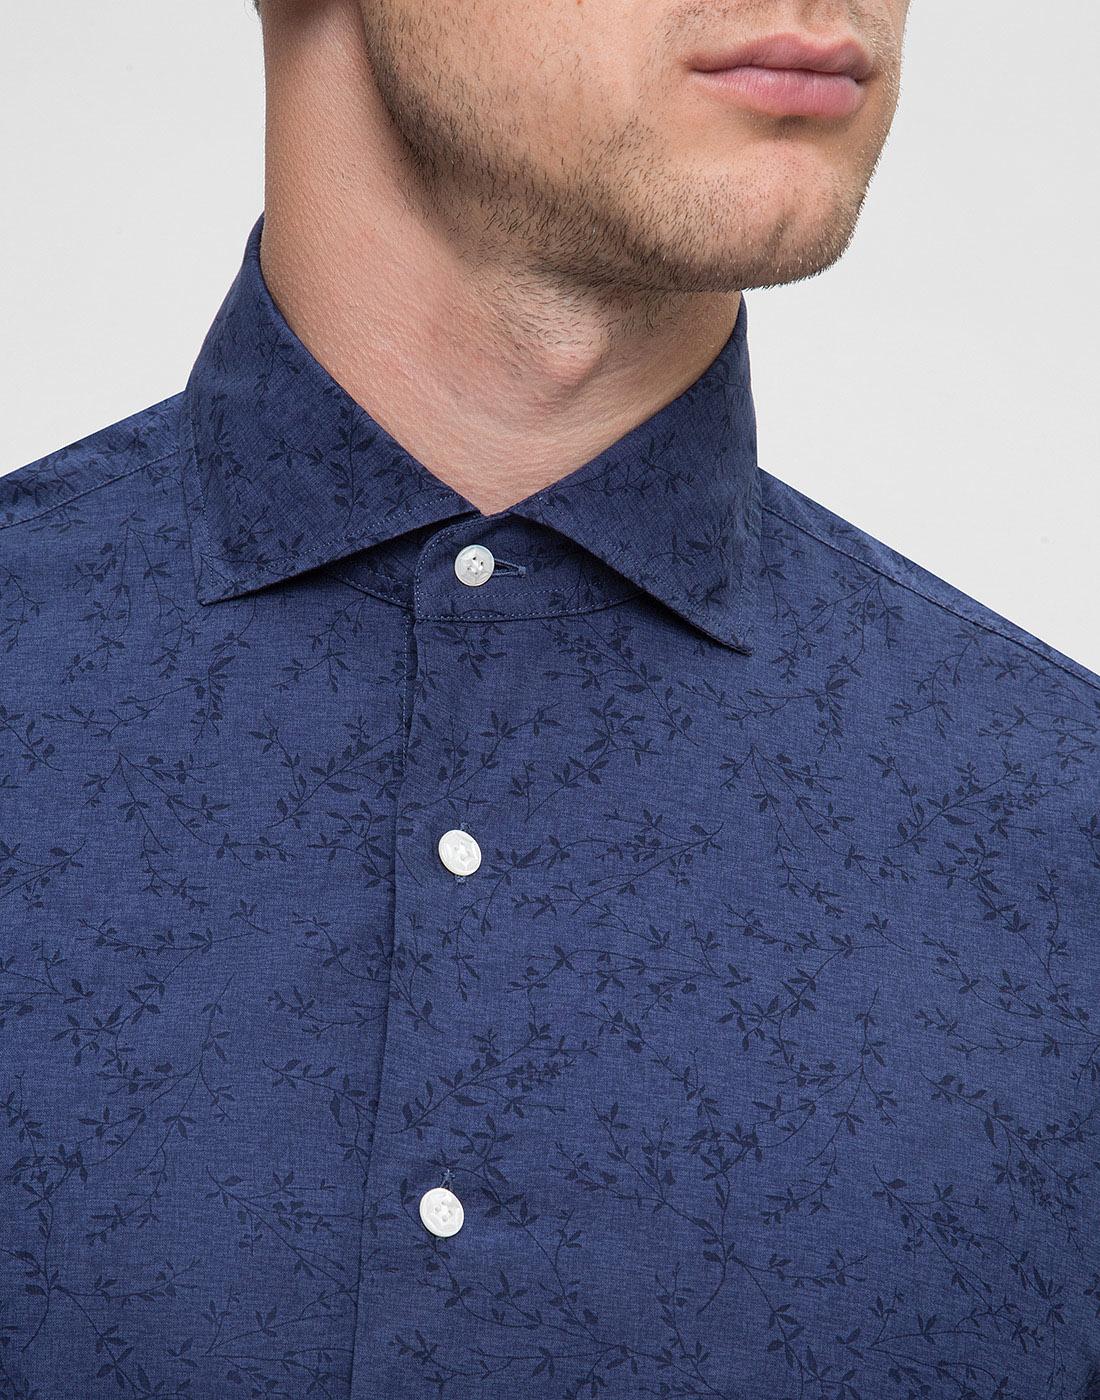 Мужская синяя рубашка Barba S554801U-6